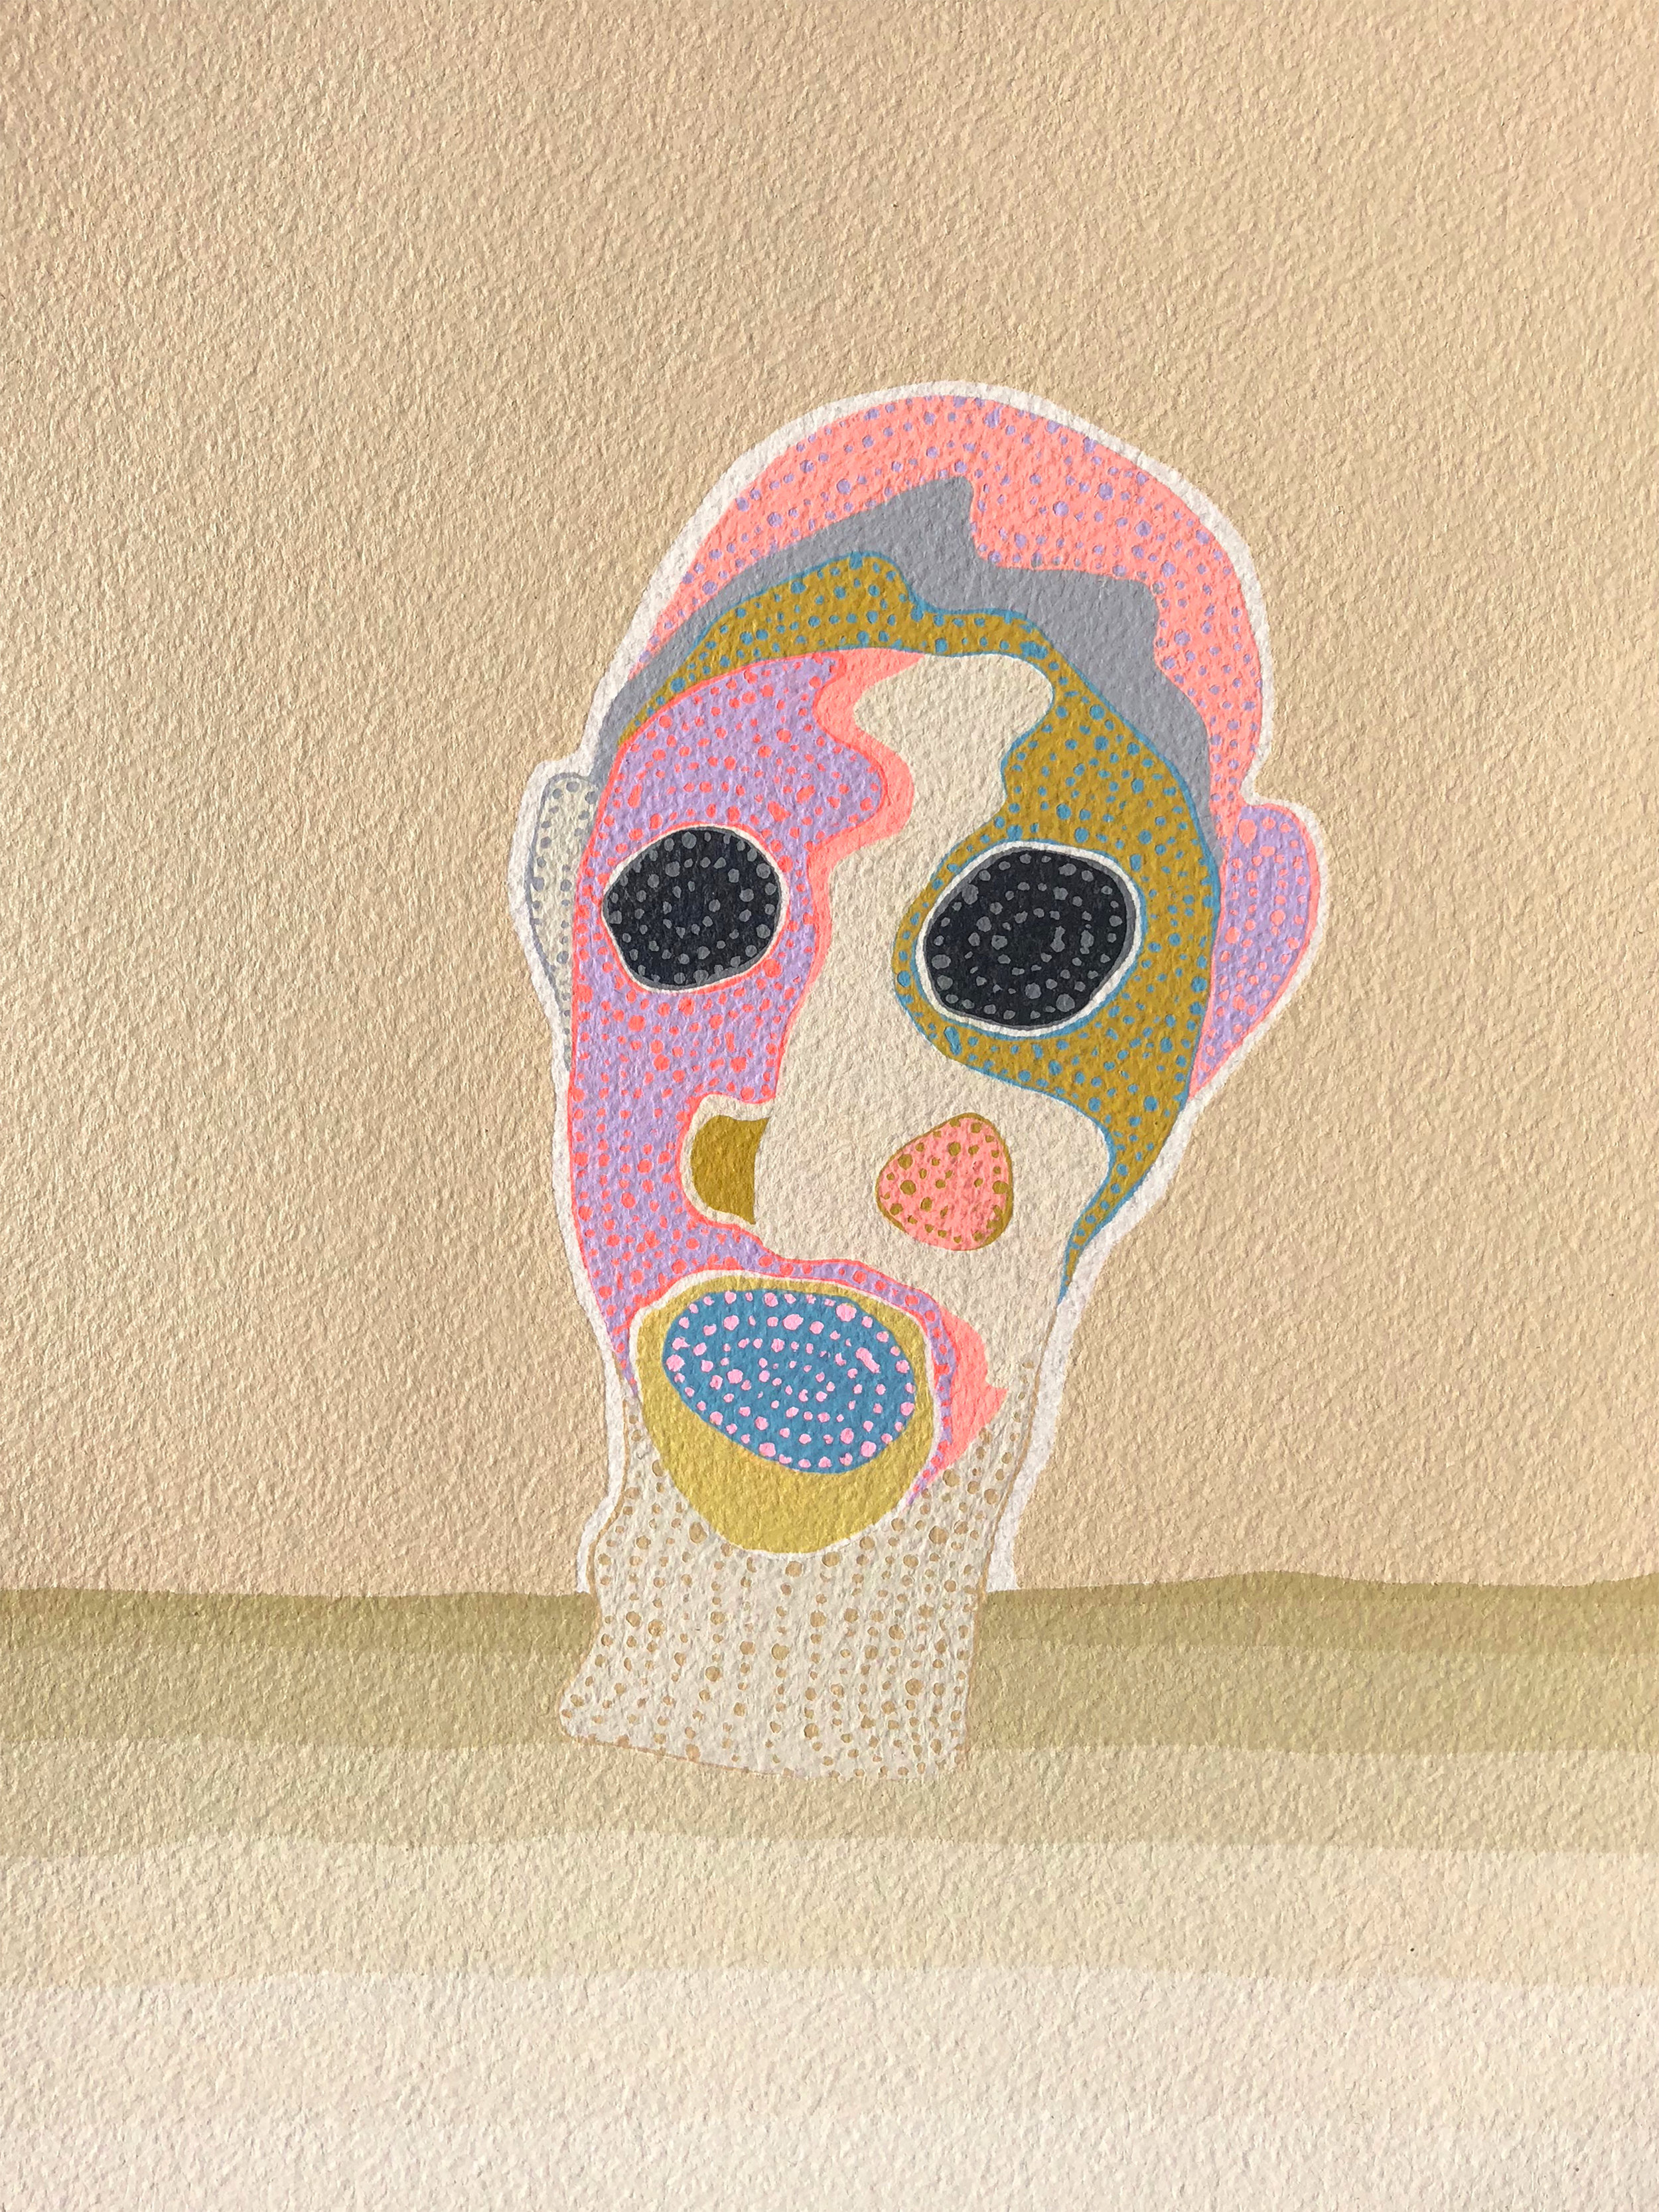 hyper colour head II